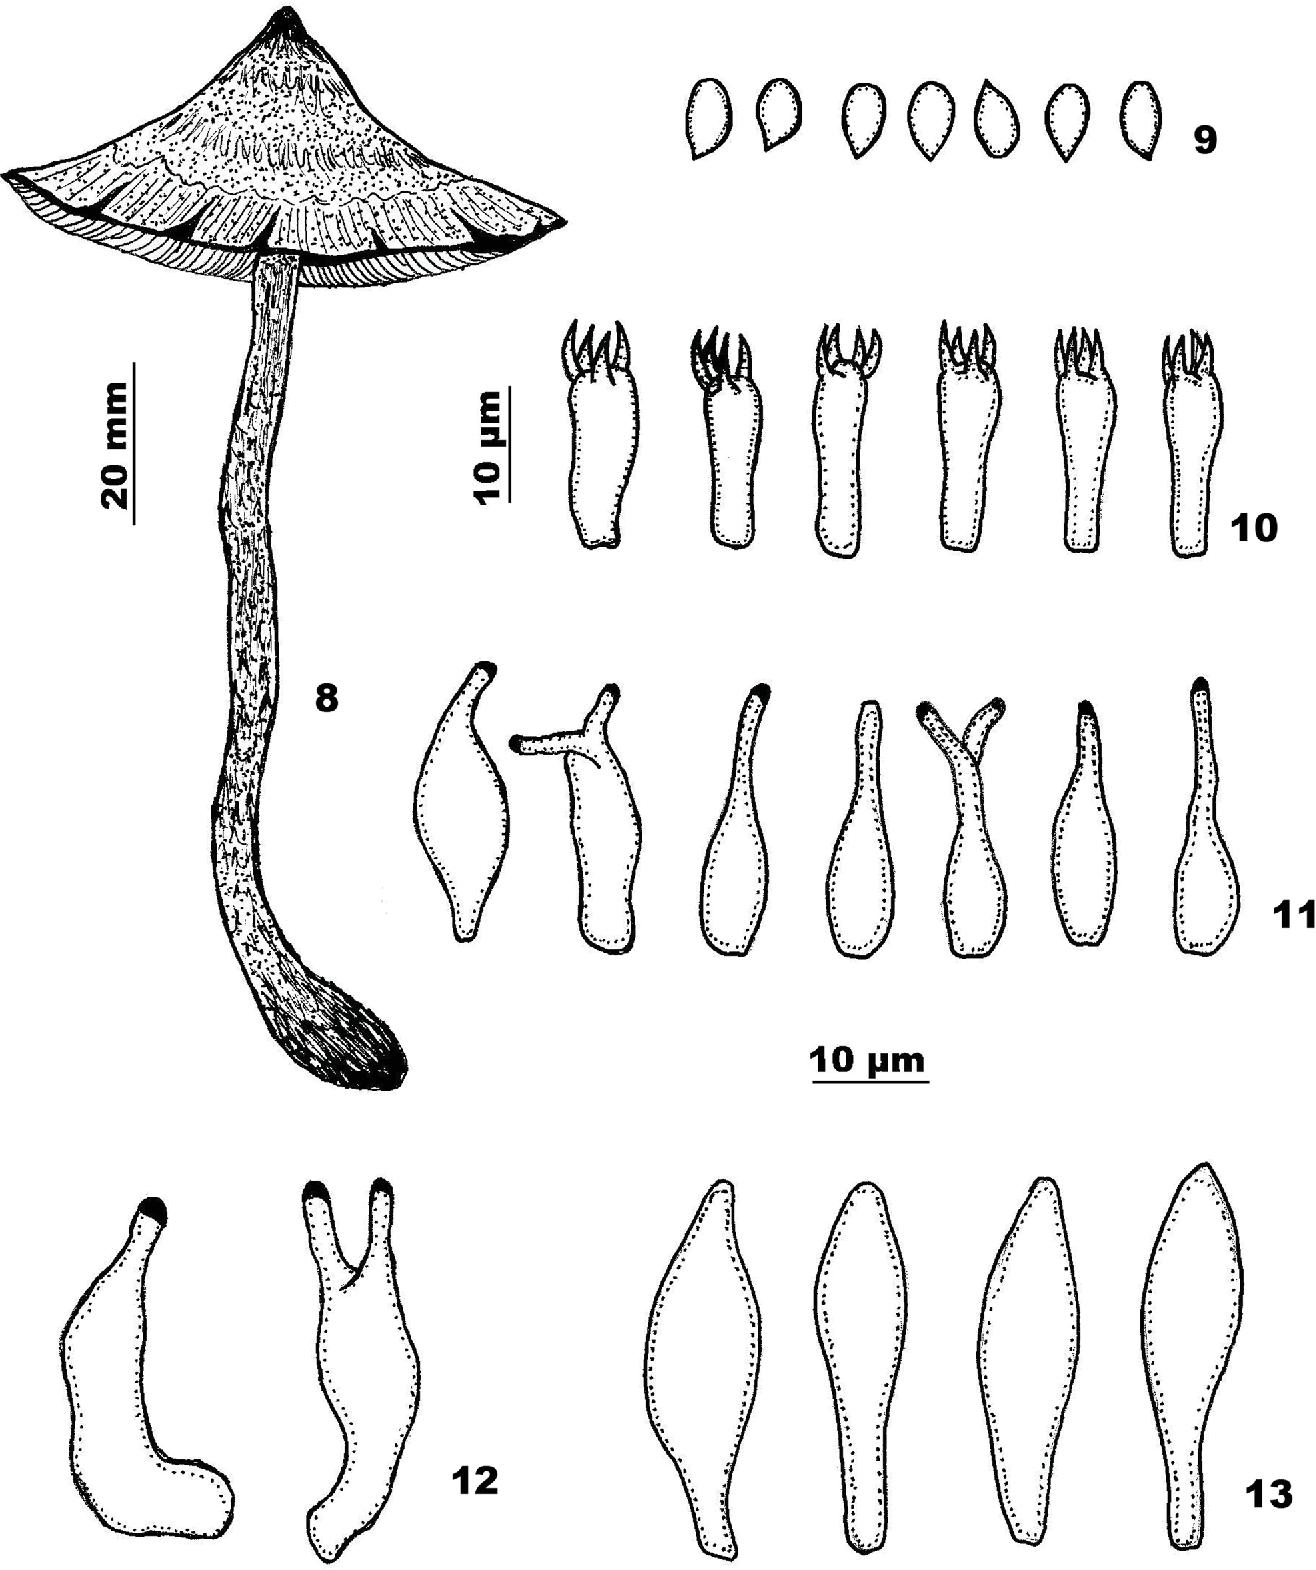 figure 8-13